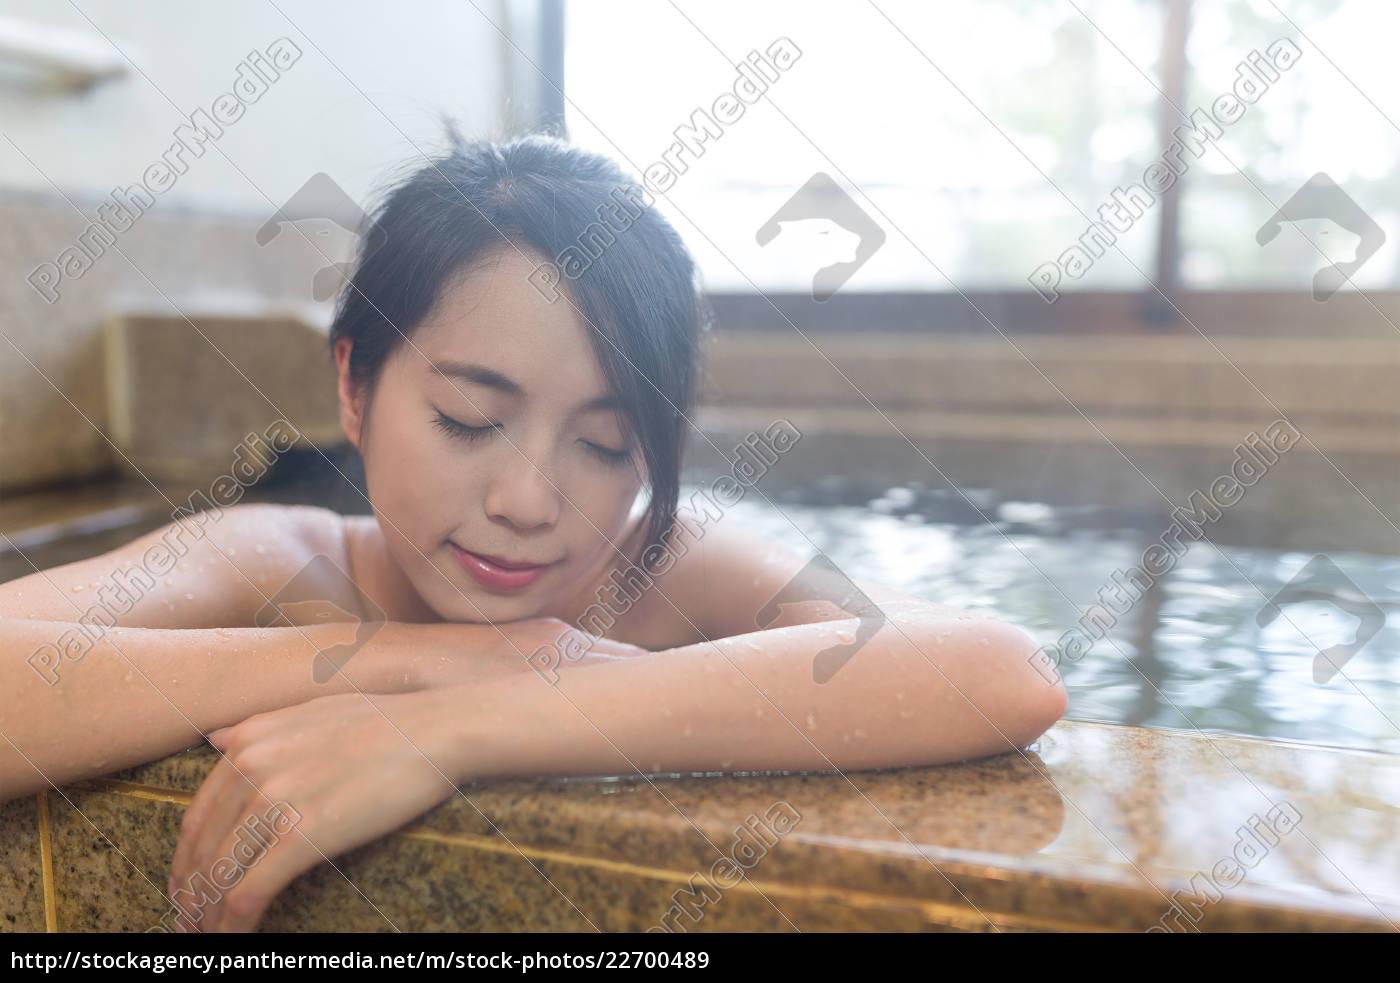 woman, enjoy, bathing, indoor - 22700489